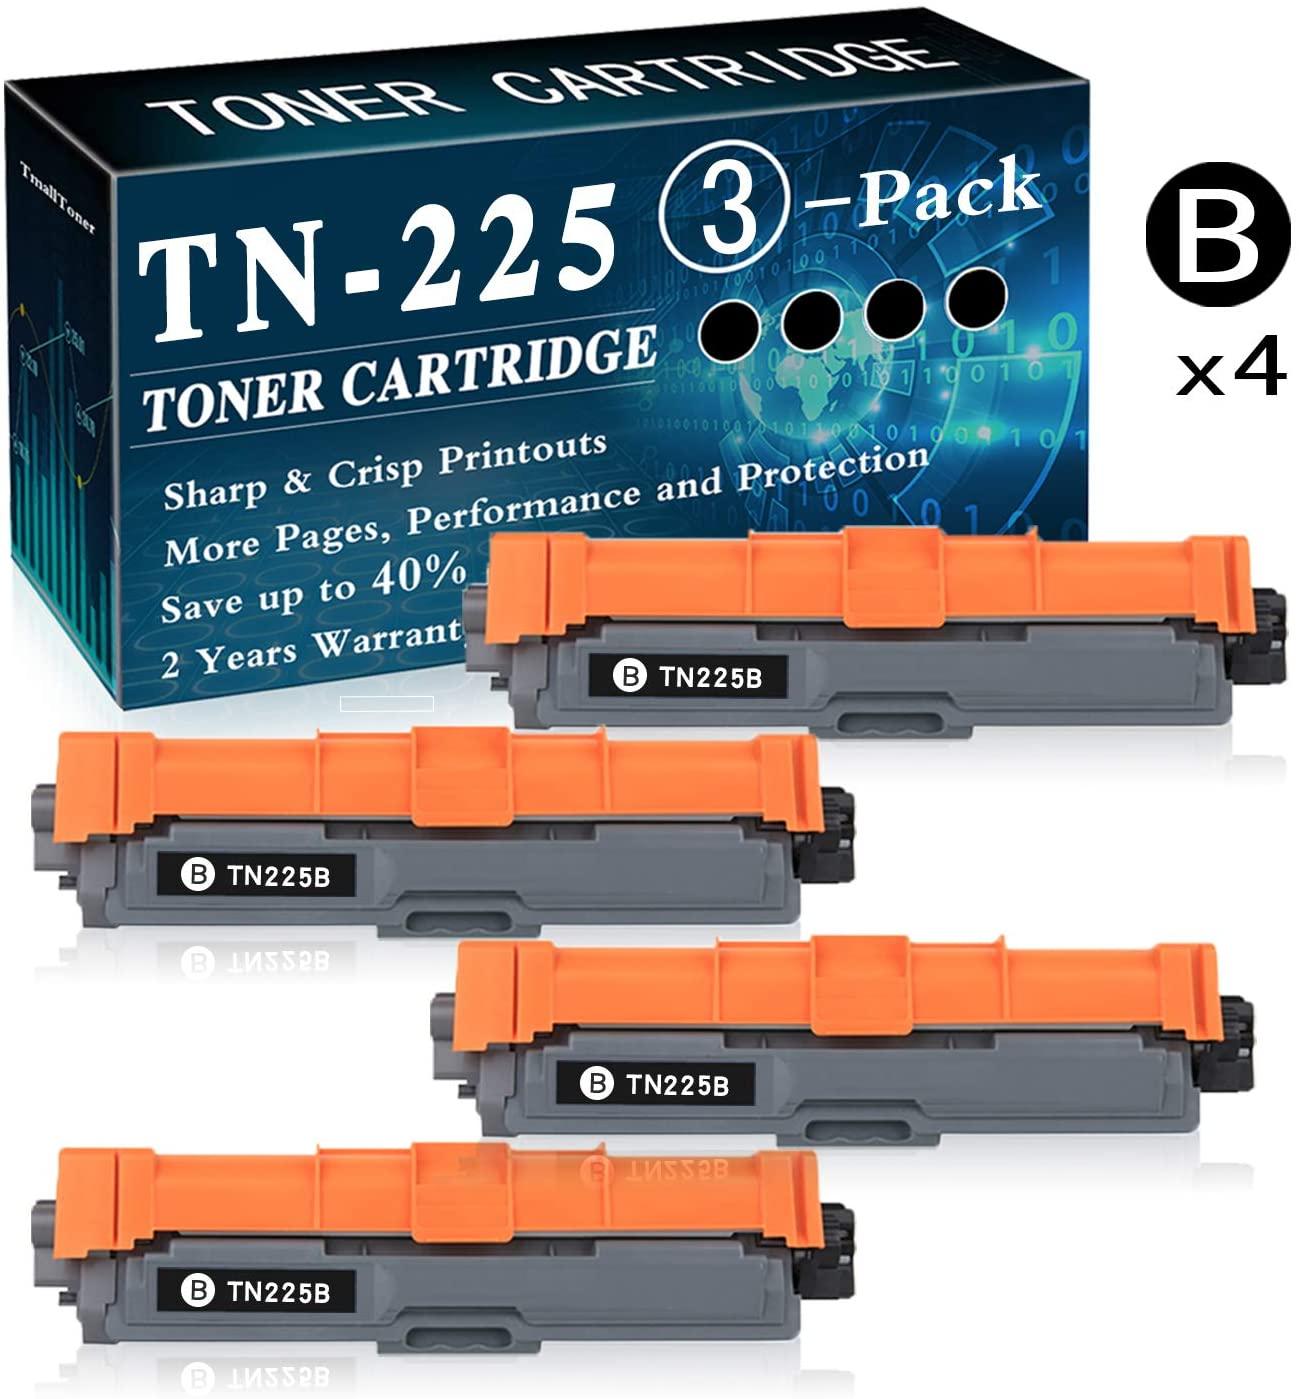 4-Pack Black TN-225 Toner Cartridge Replacement for Brother Laserjet HL-3140CW HL-3150CDN MFC-9130CW MFC-9330CDW DCP-9015CDW DCP-9020CDN Printer Printer,by TmallToner